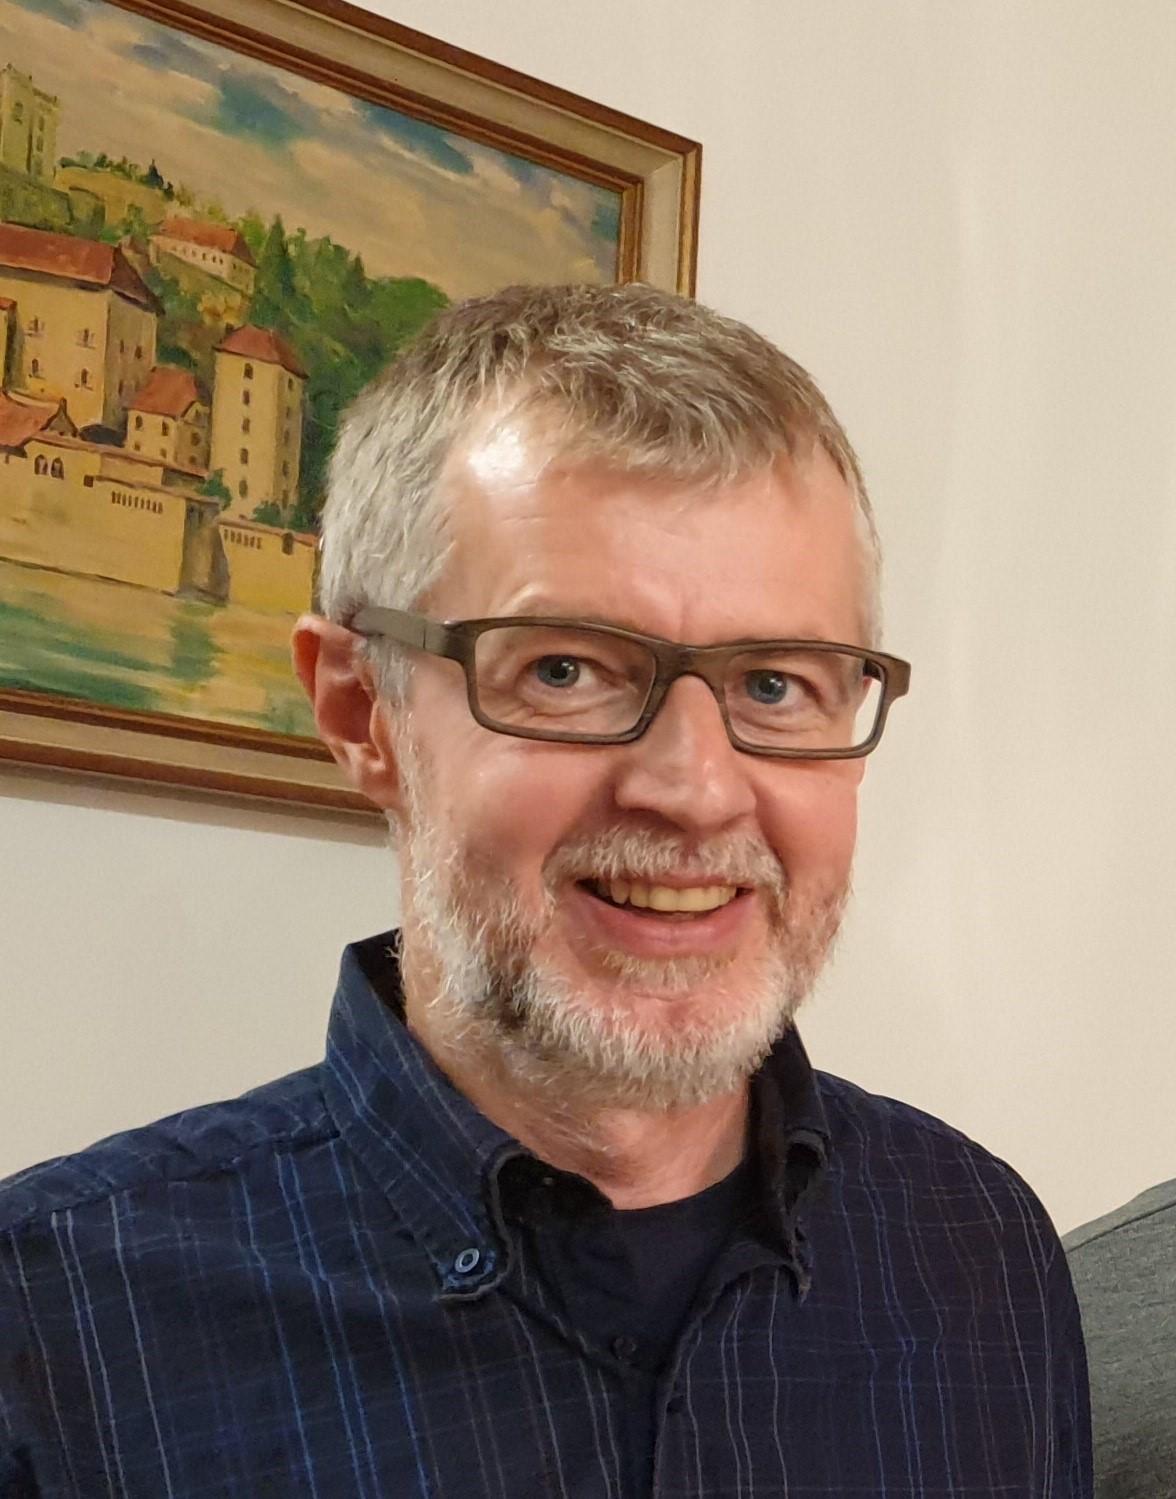 Reihofer Jürgen 1